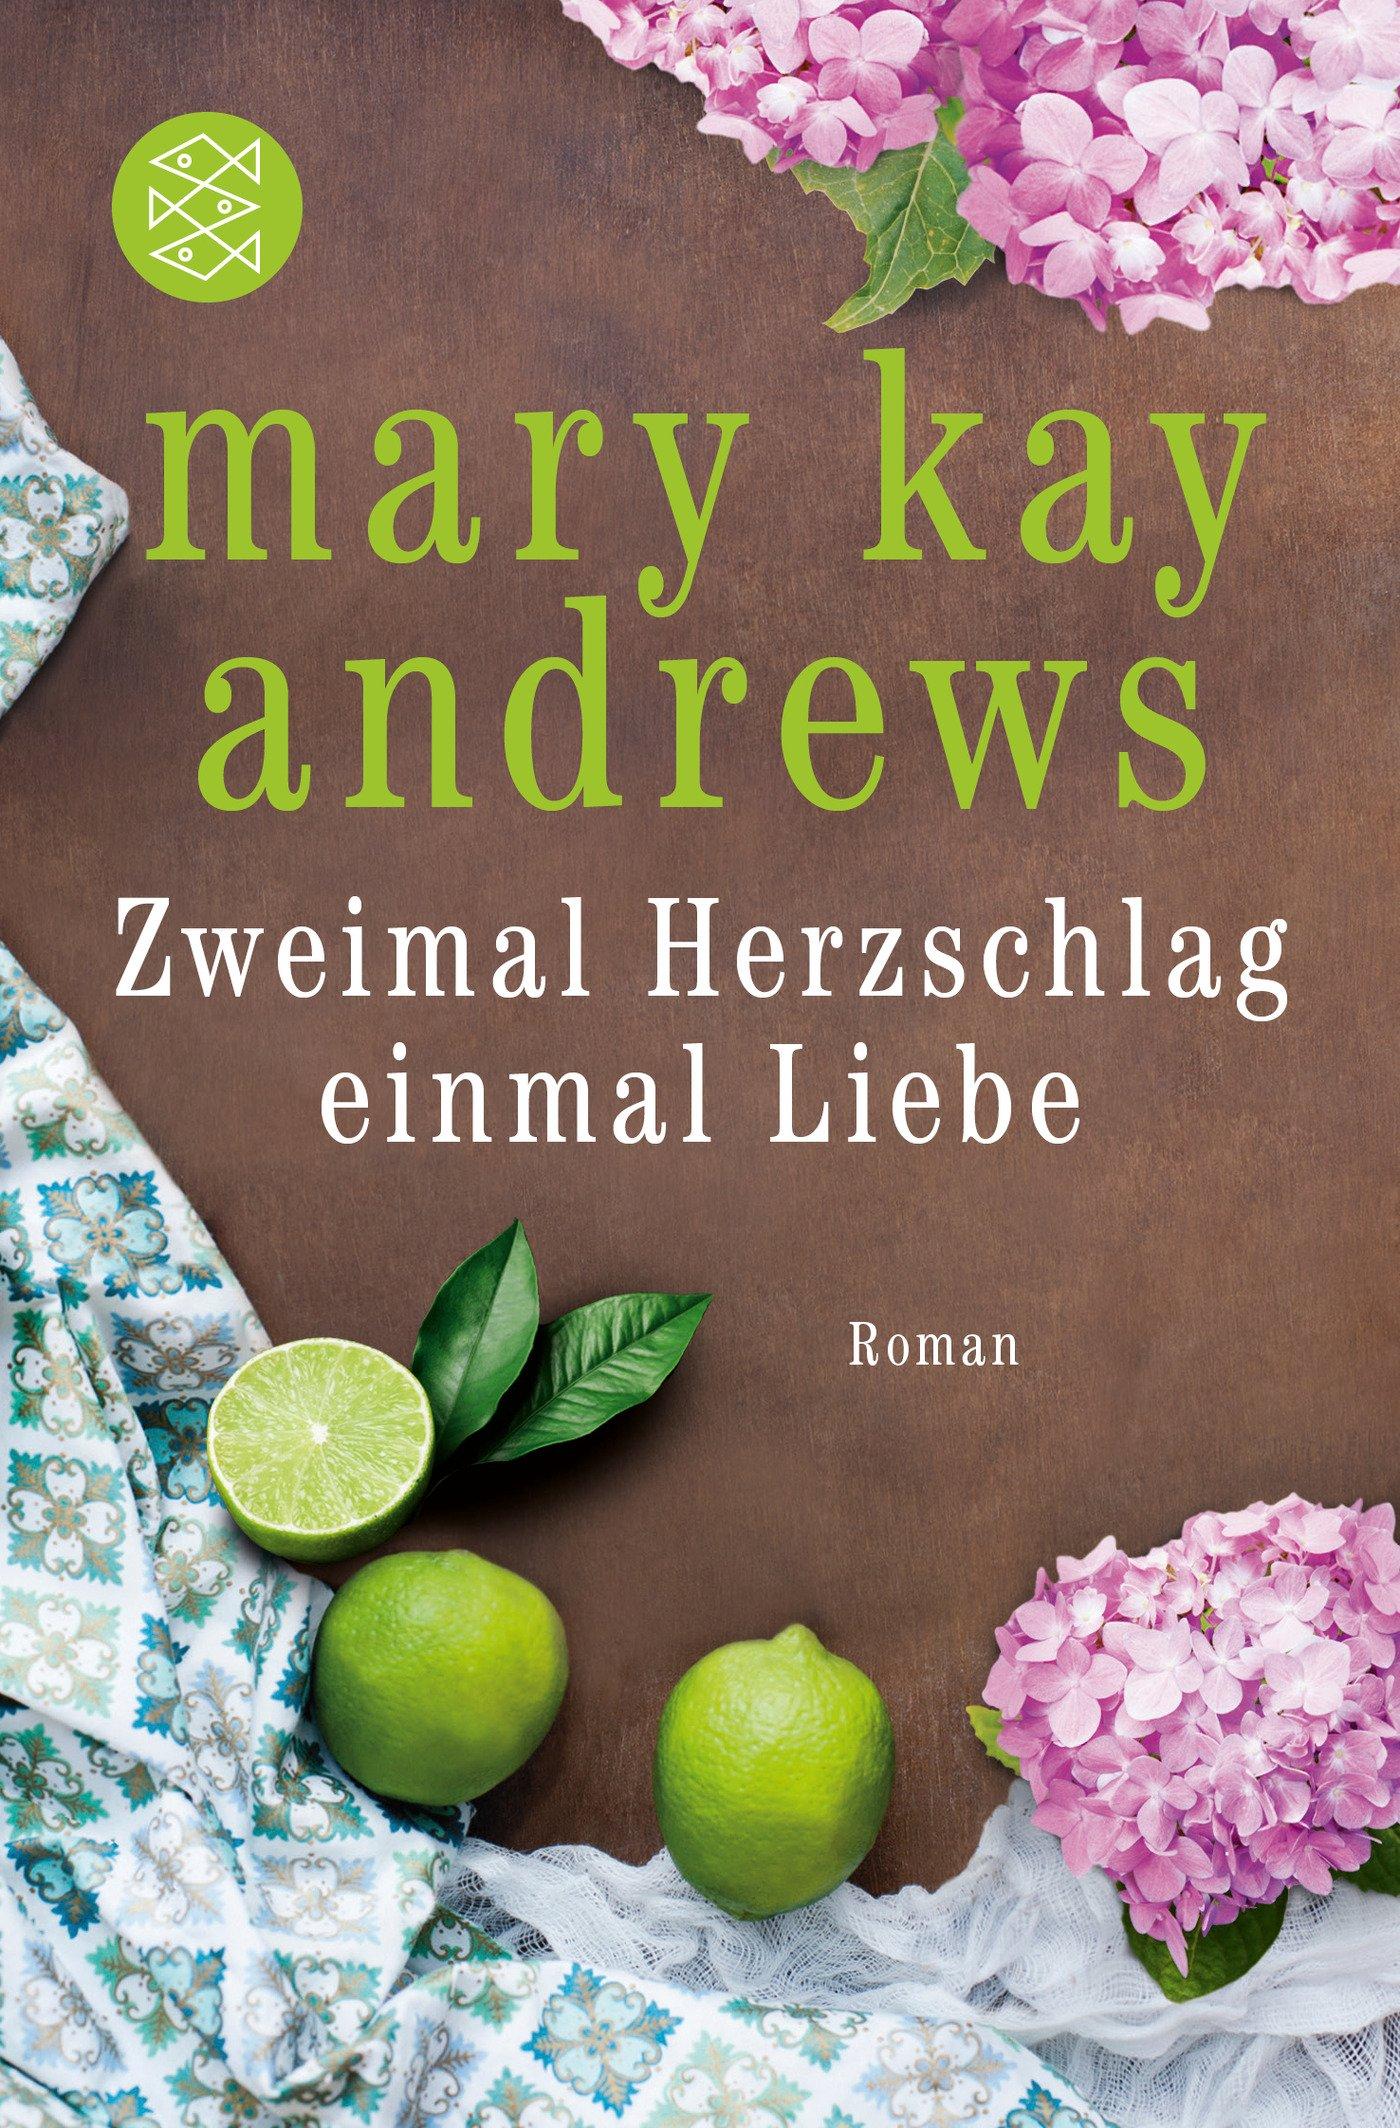 Zweimal Herzschlag, einmal Liebe: Roman: Amazon.de: Mary Kay Andrews ...